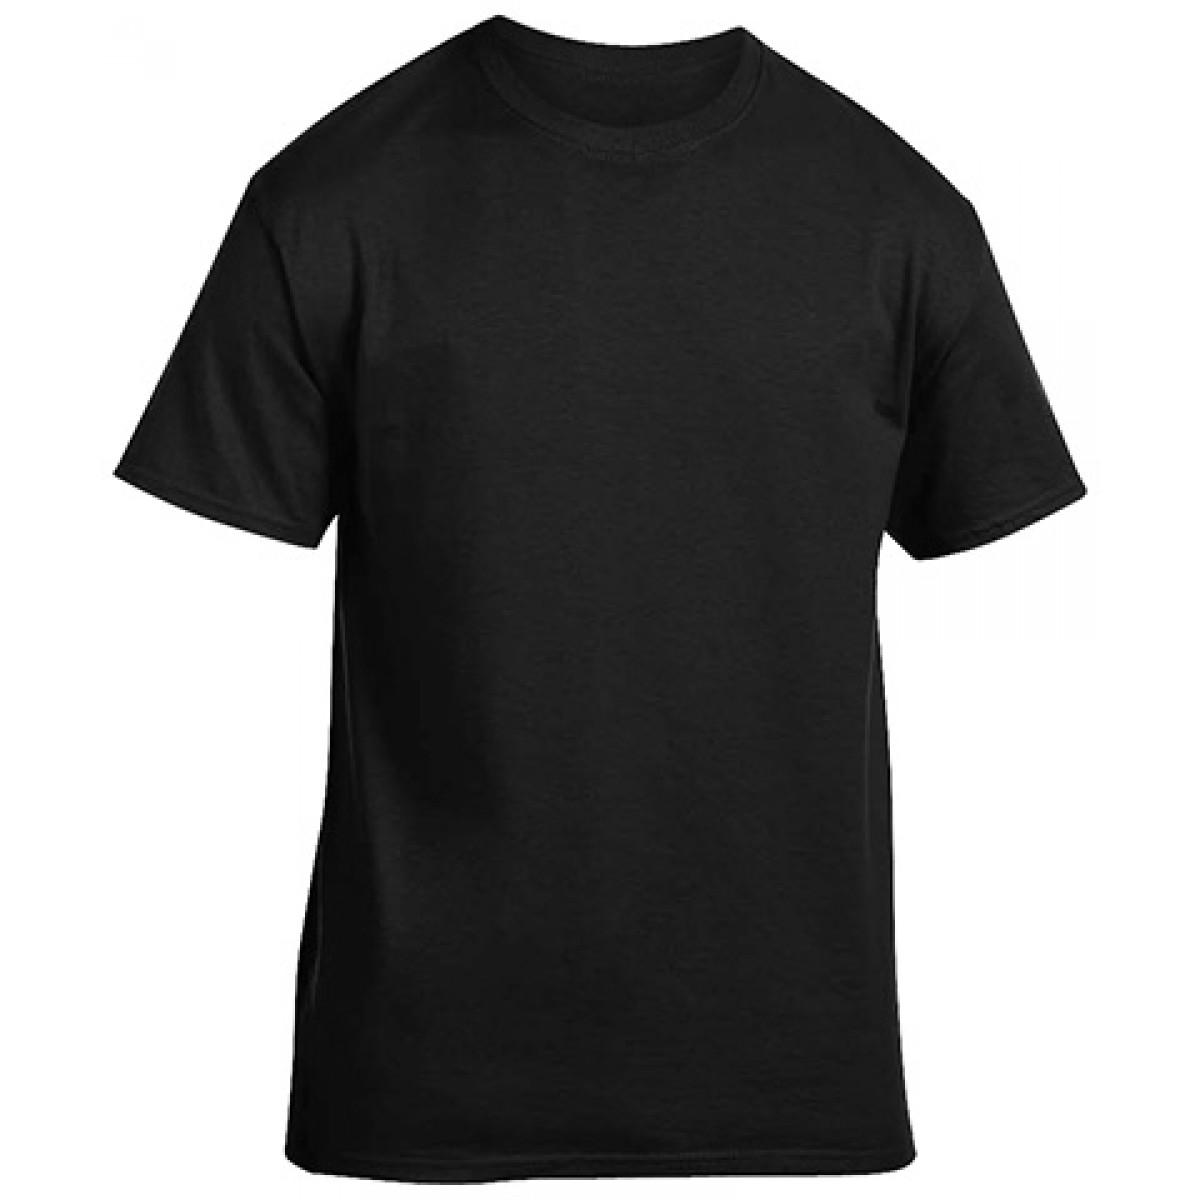 Cotton Short Sleeve T-Shirt-Black-YS